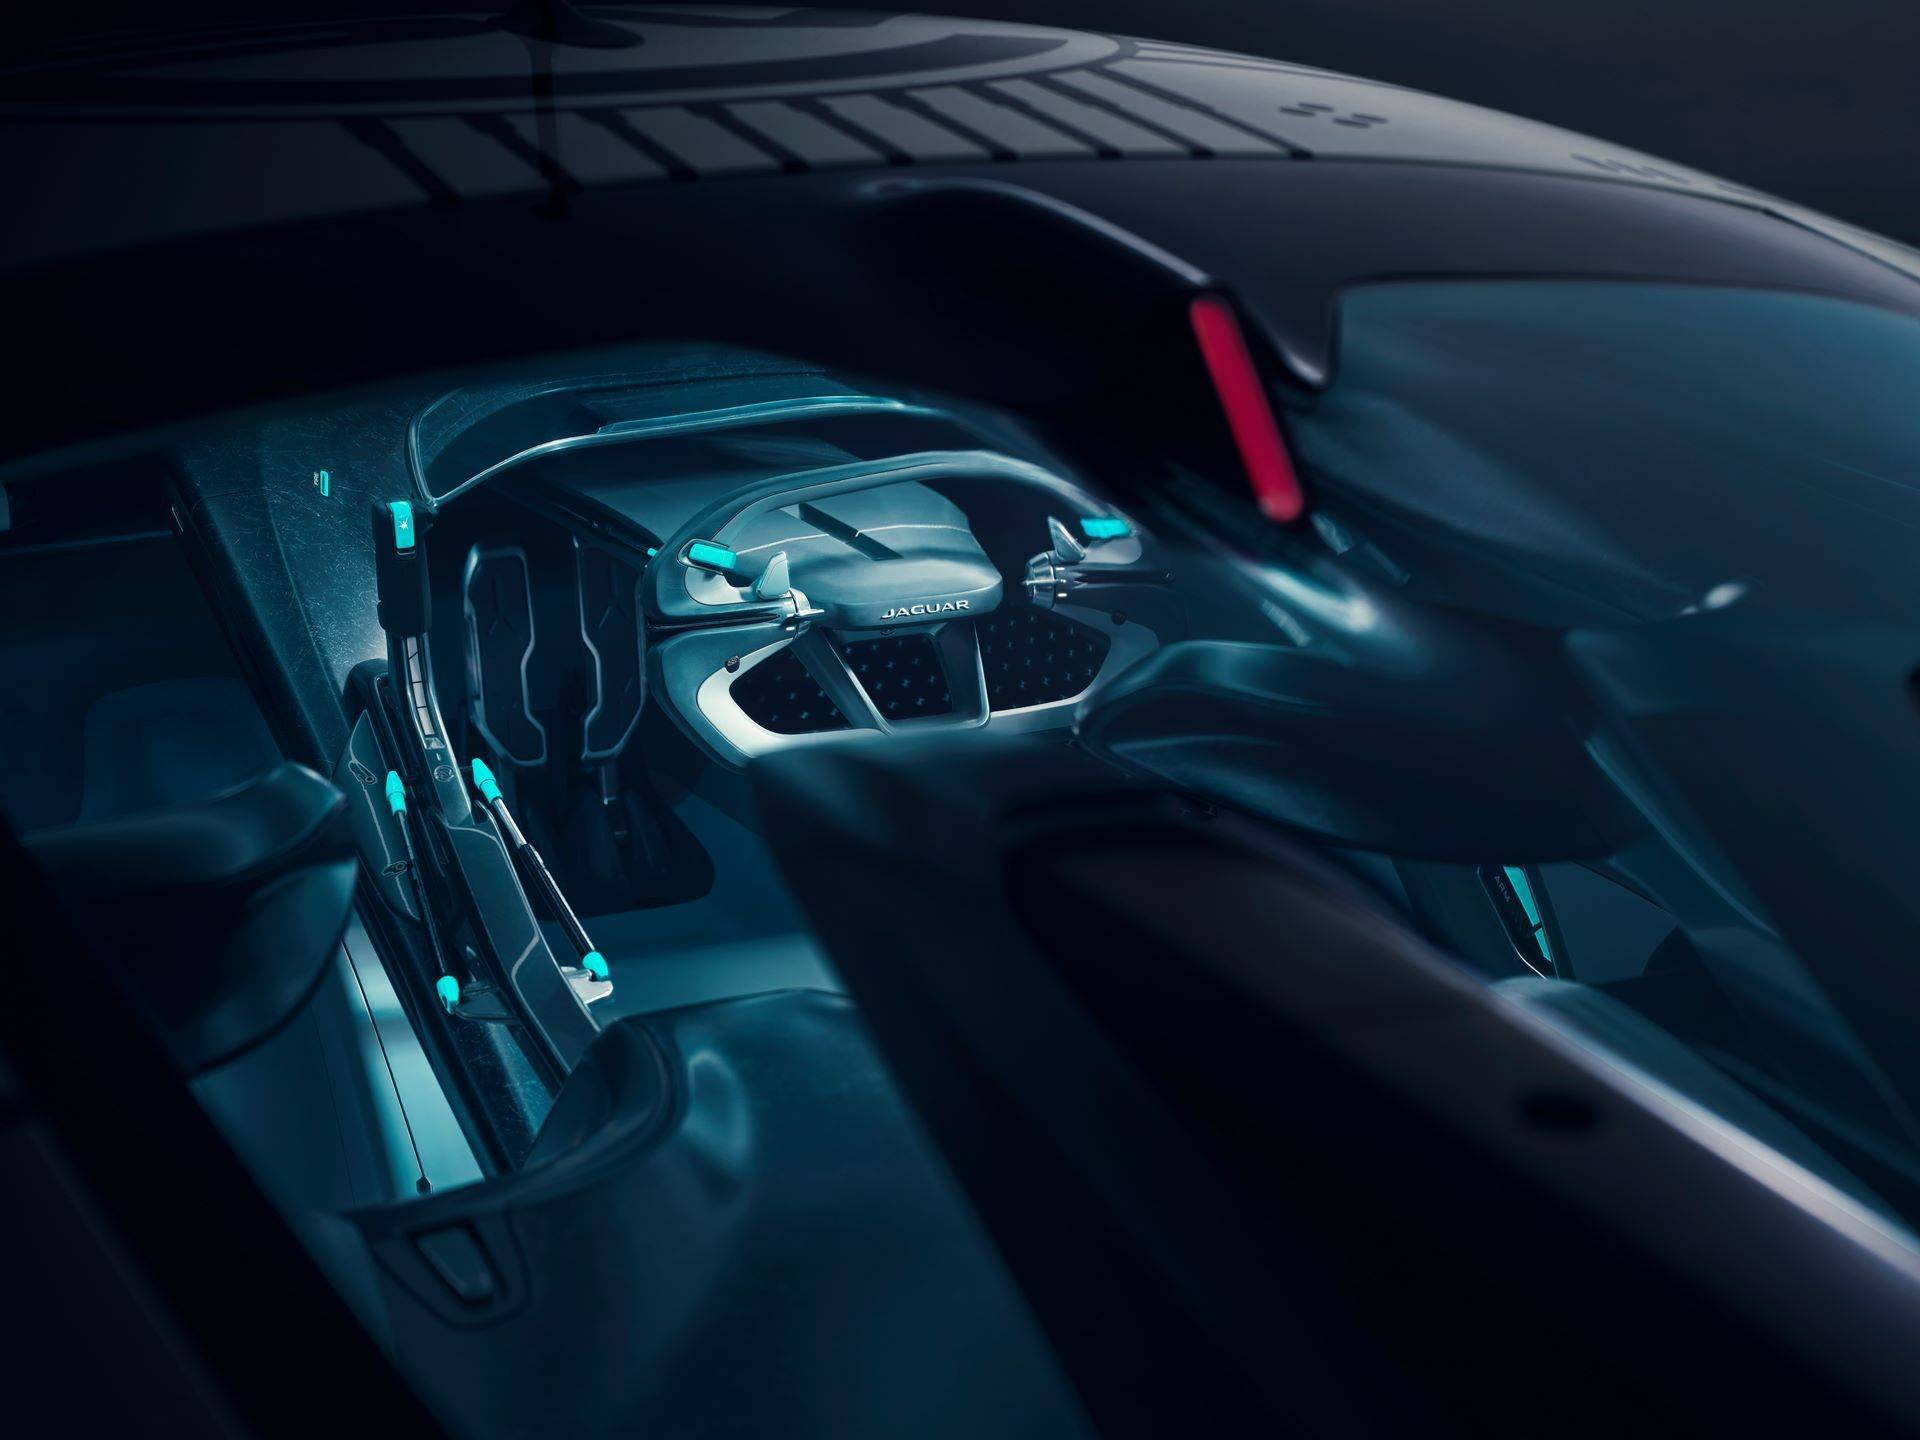 Jaguar-Vision-Gran-Turismo-SV-13